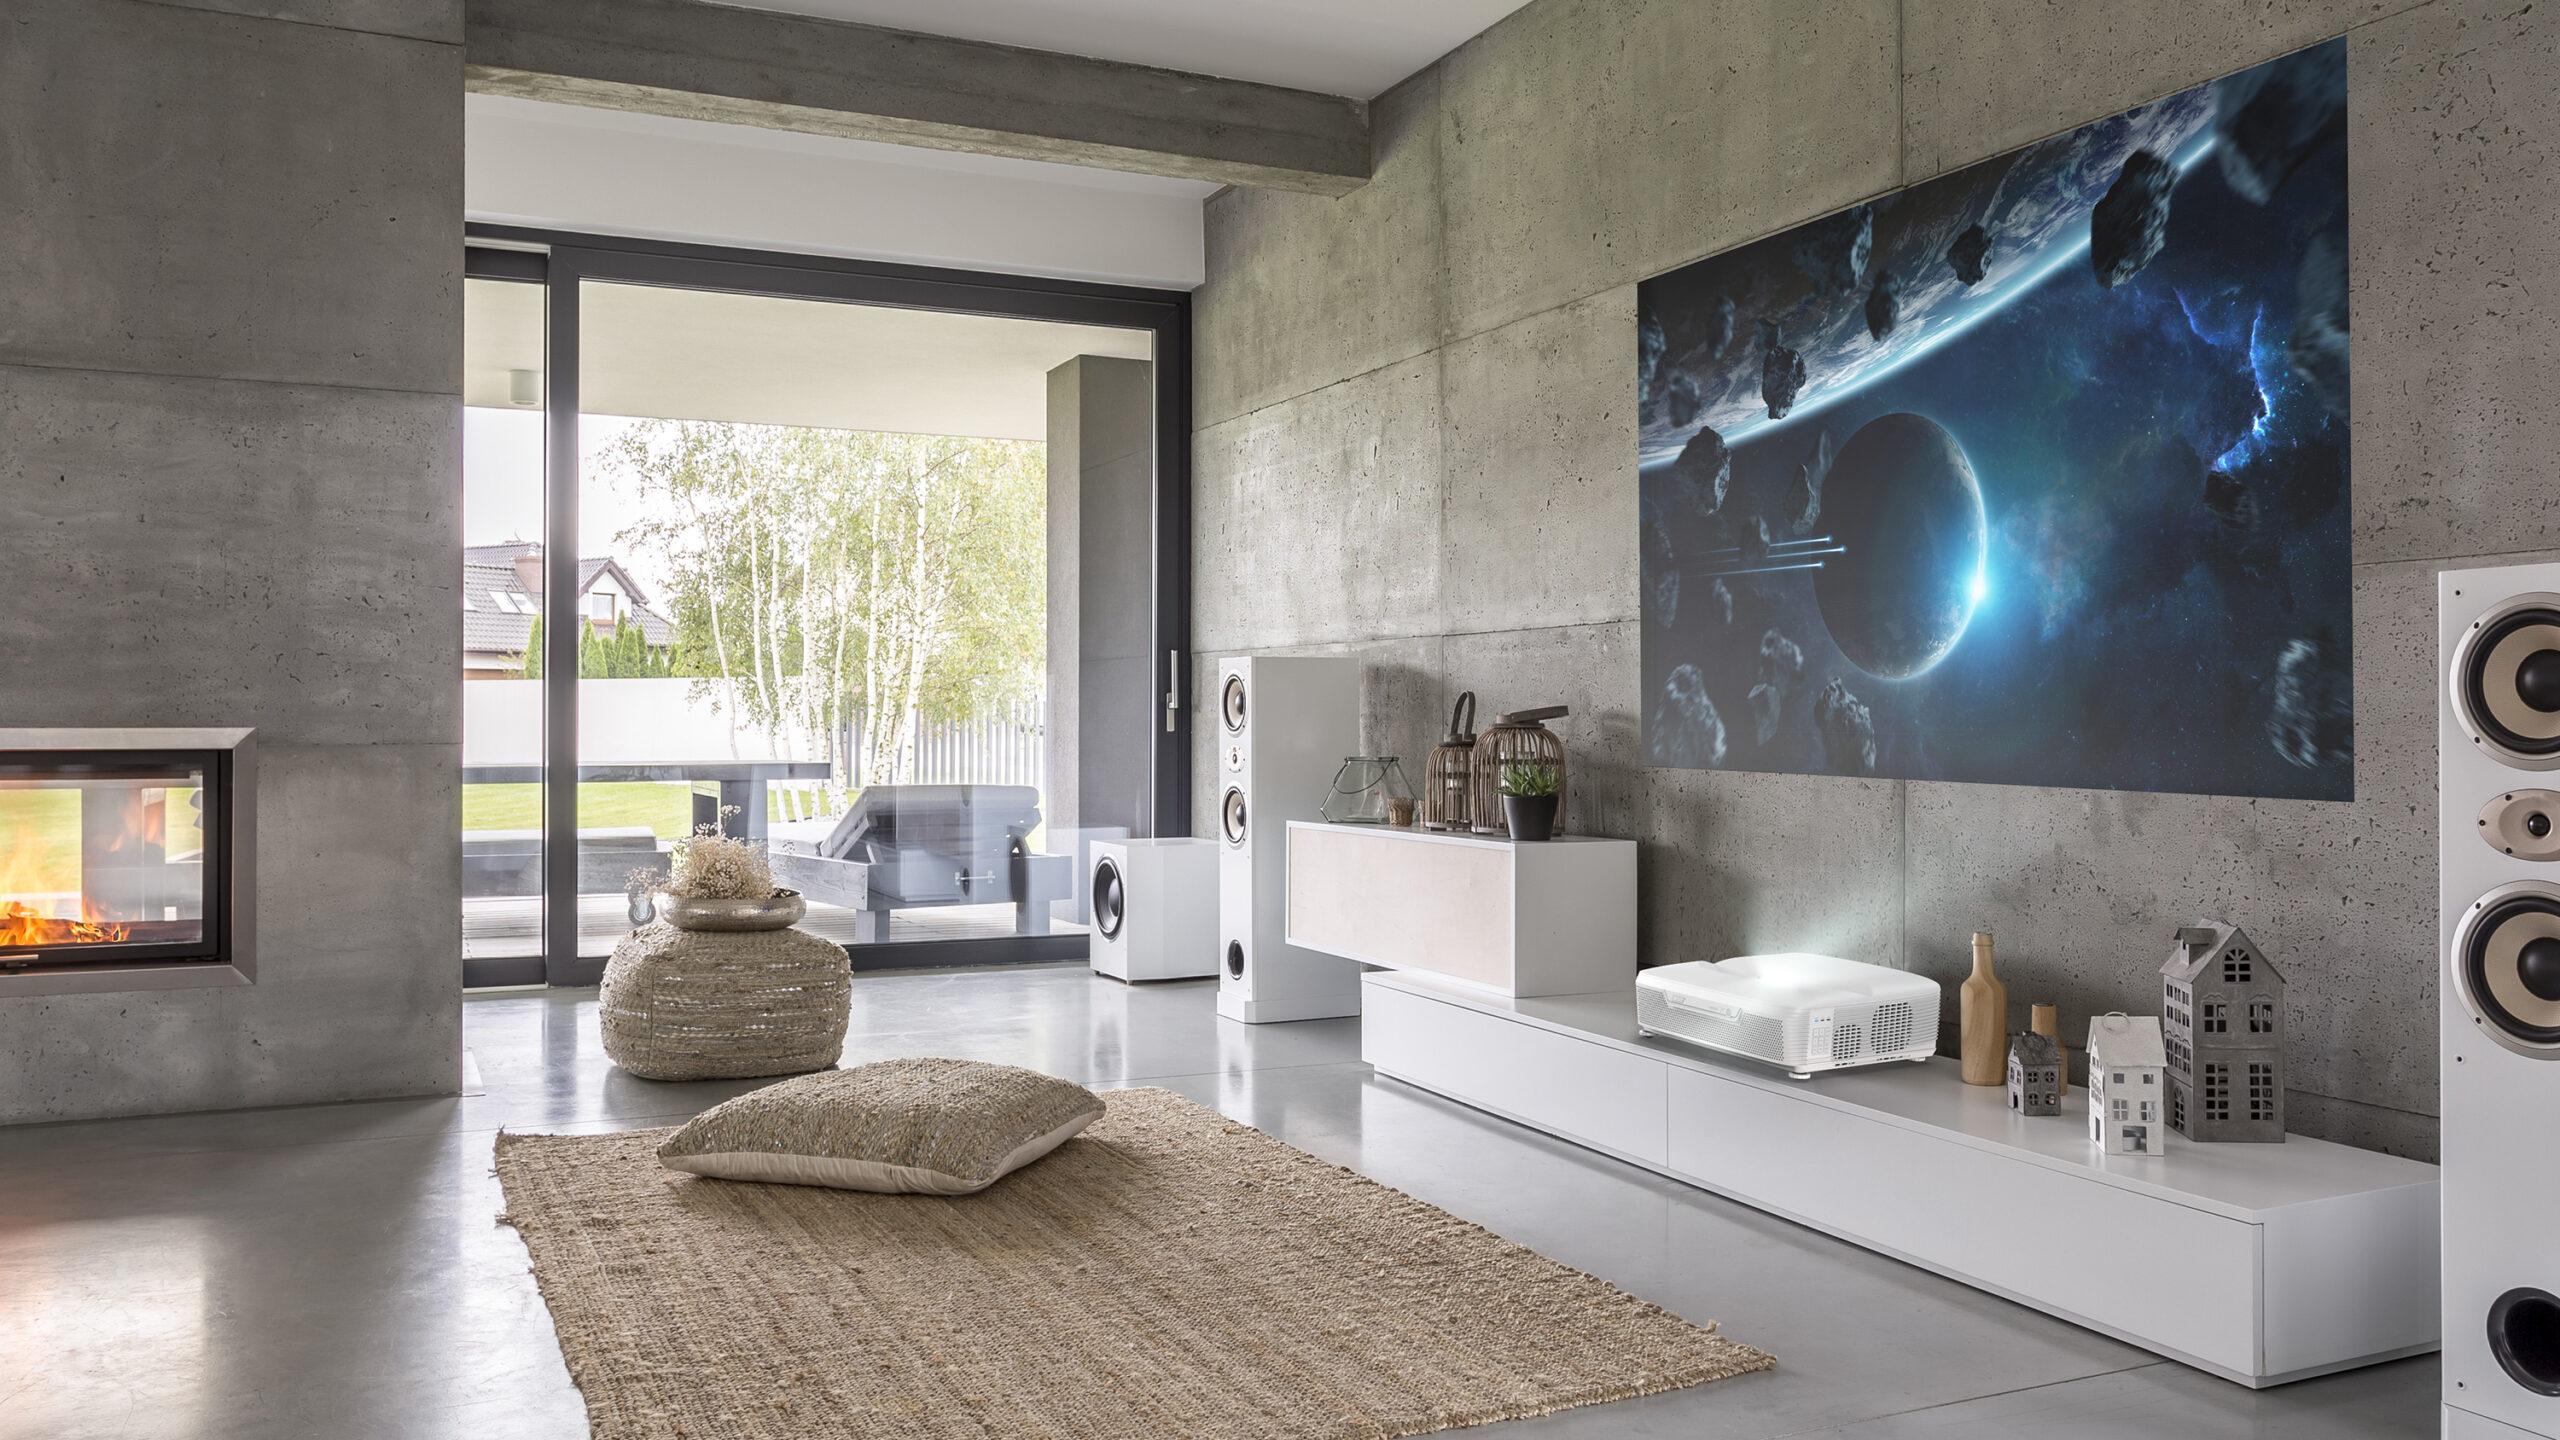 acer-lanca-novos-monitores-e-projetor-4k